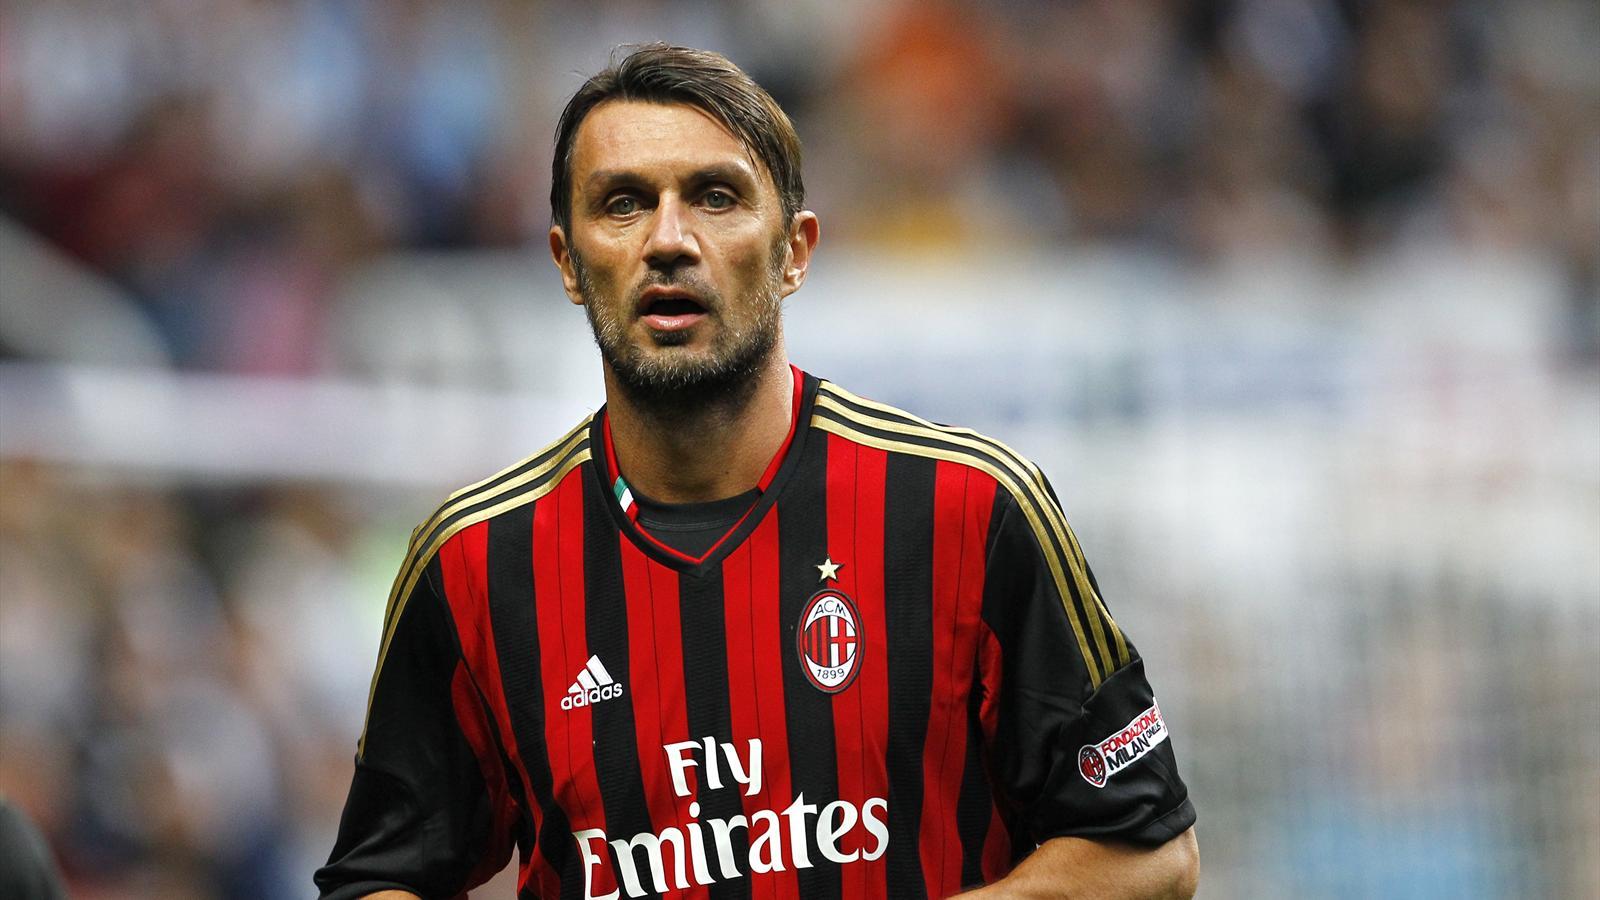 Paolo Maldini: Abramovich wanted me as Chelsea boss in 2009 - Premier League 2014-2015 ...